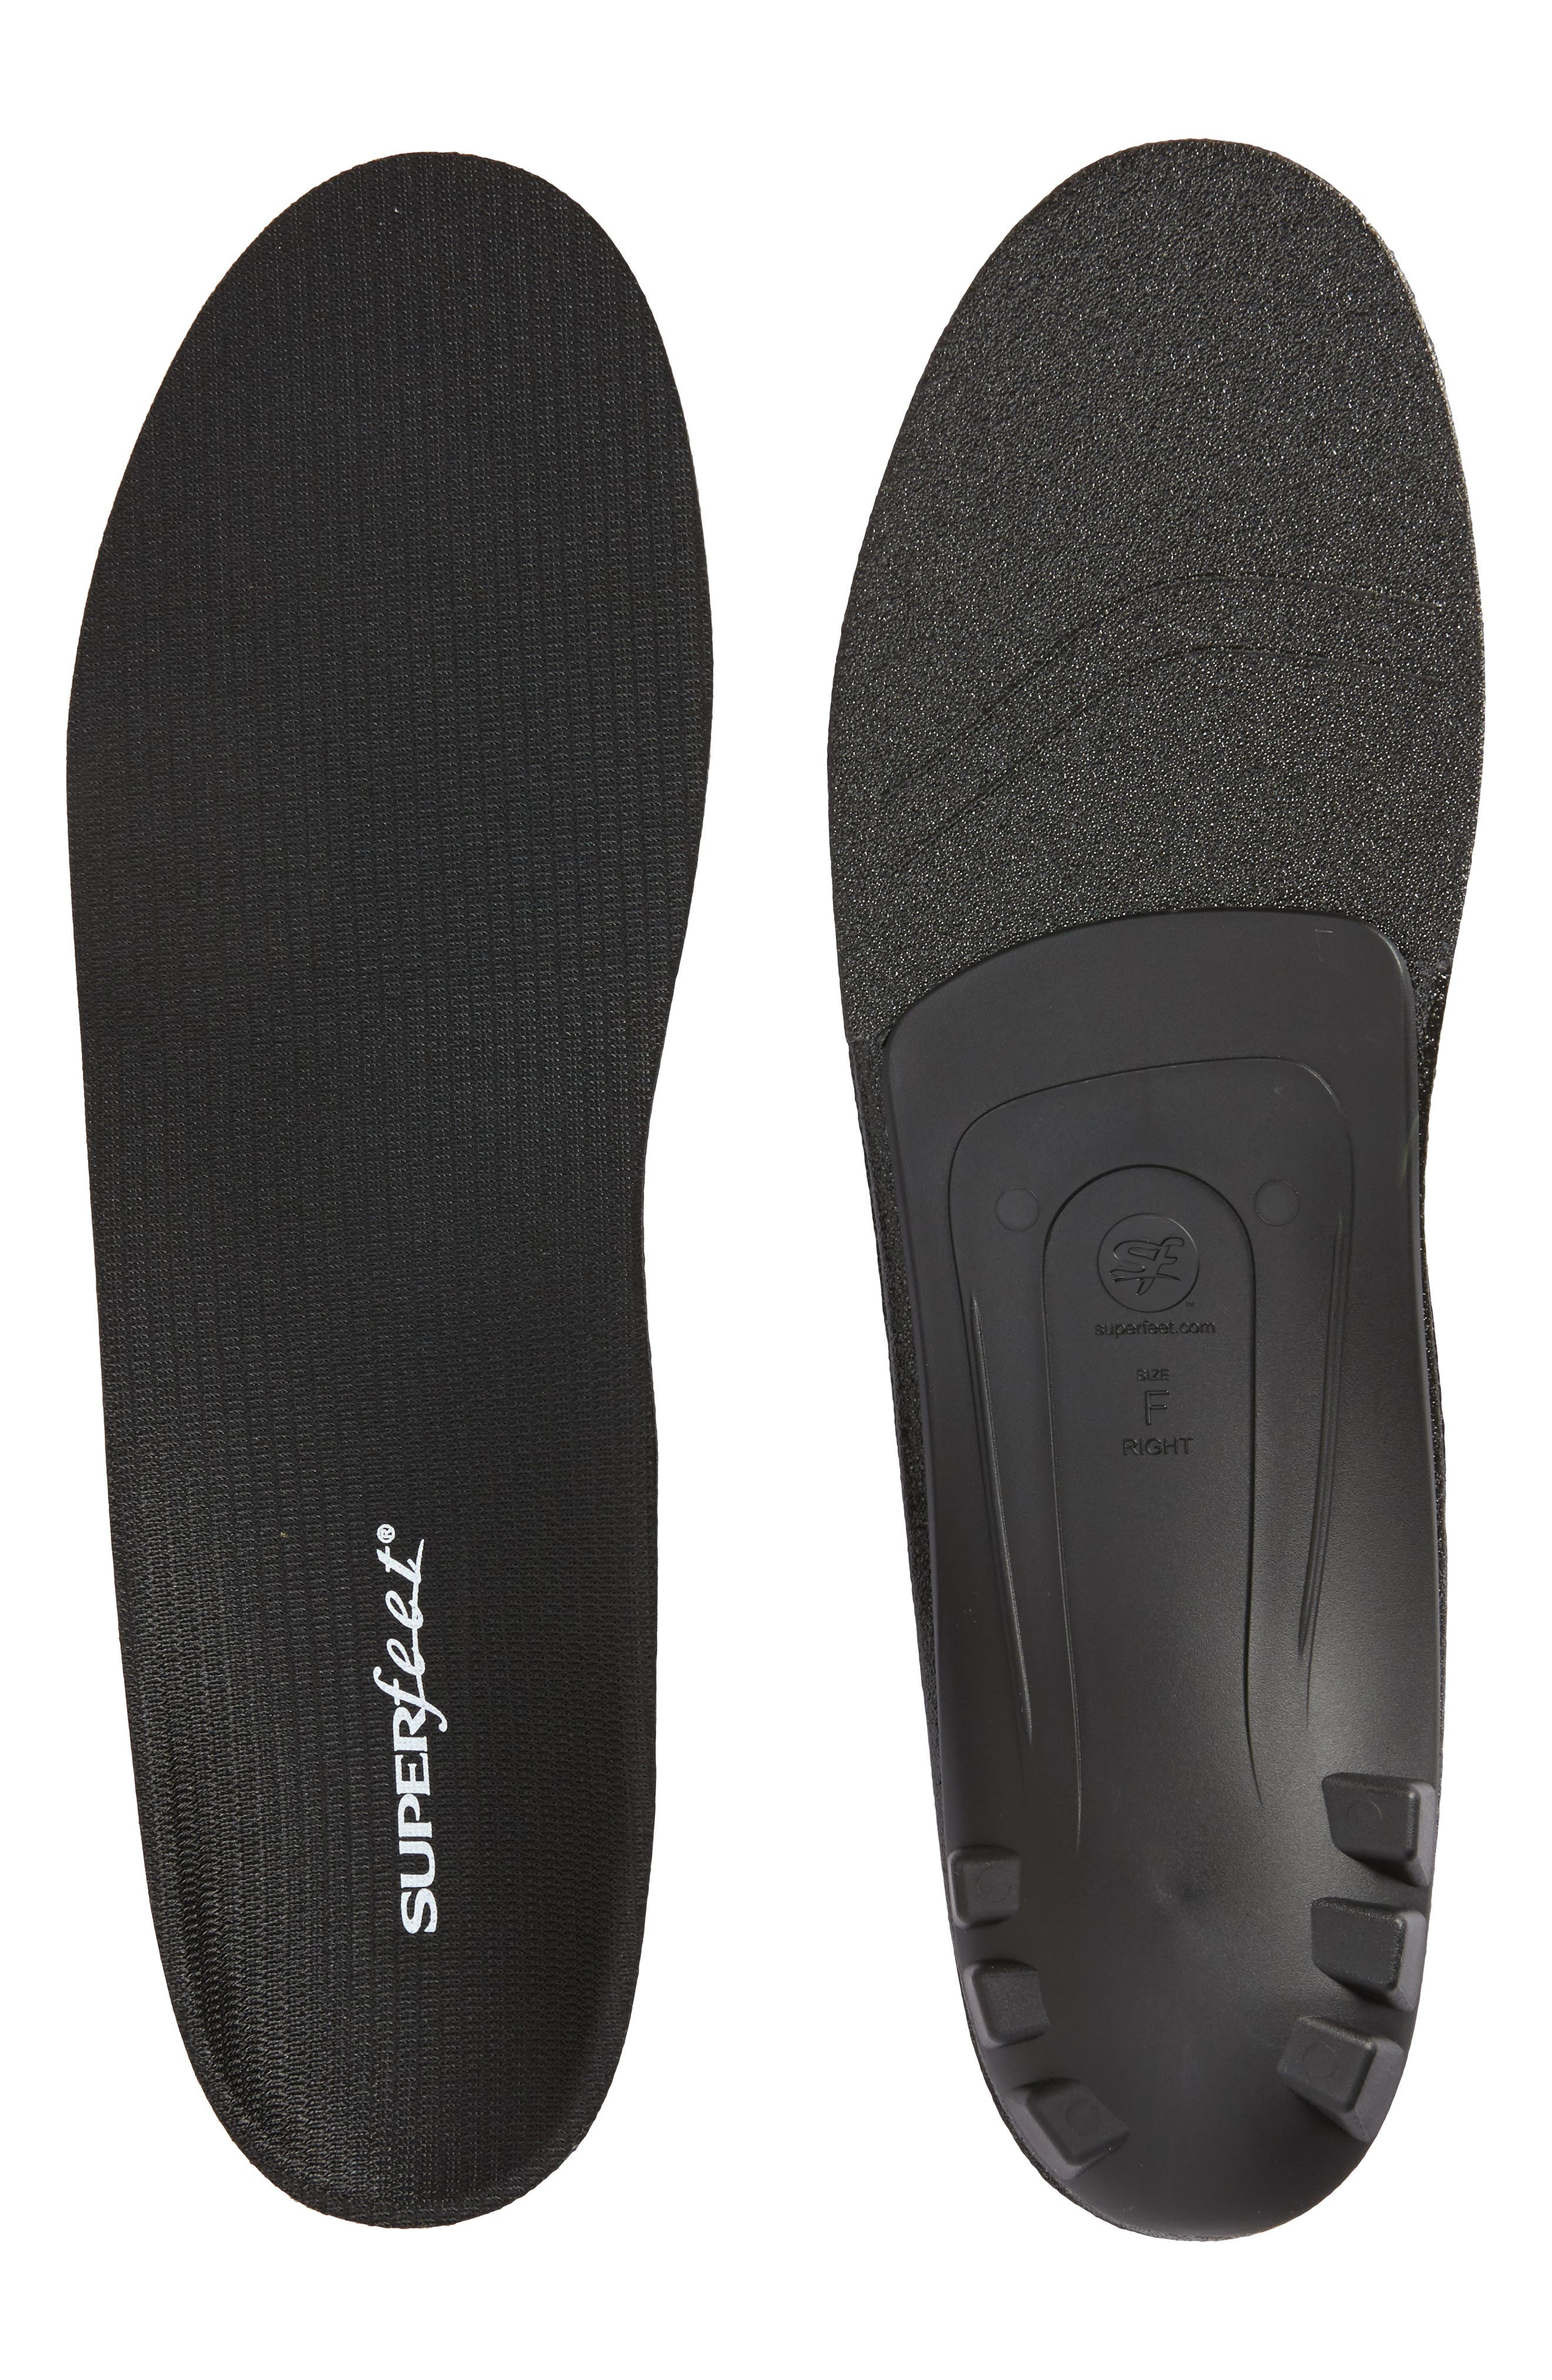 Dress Fit Black Full Length Insoles,                         Main,                         color, BLACK